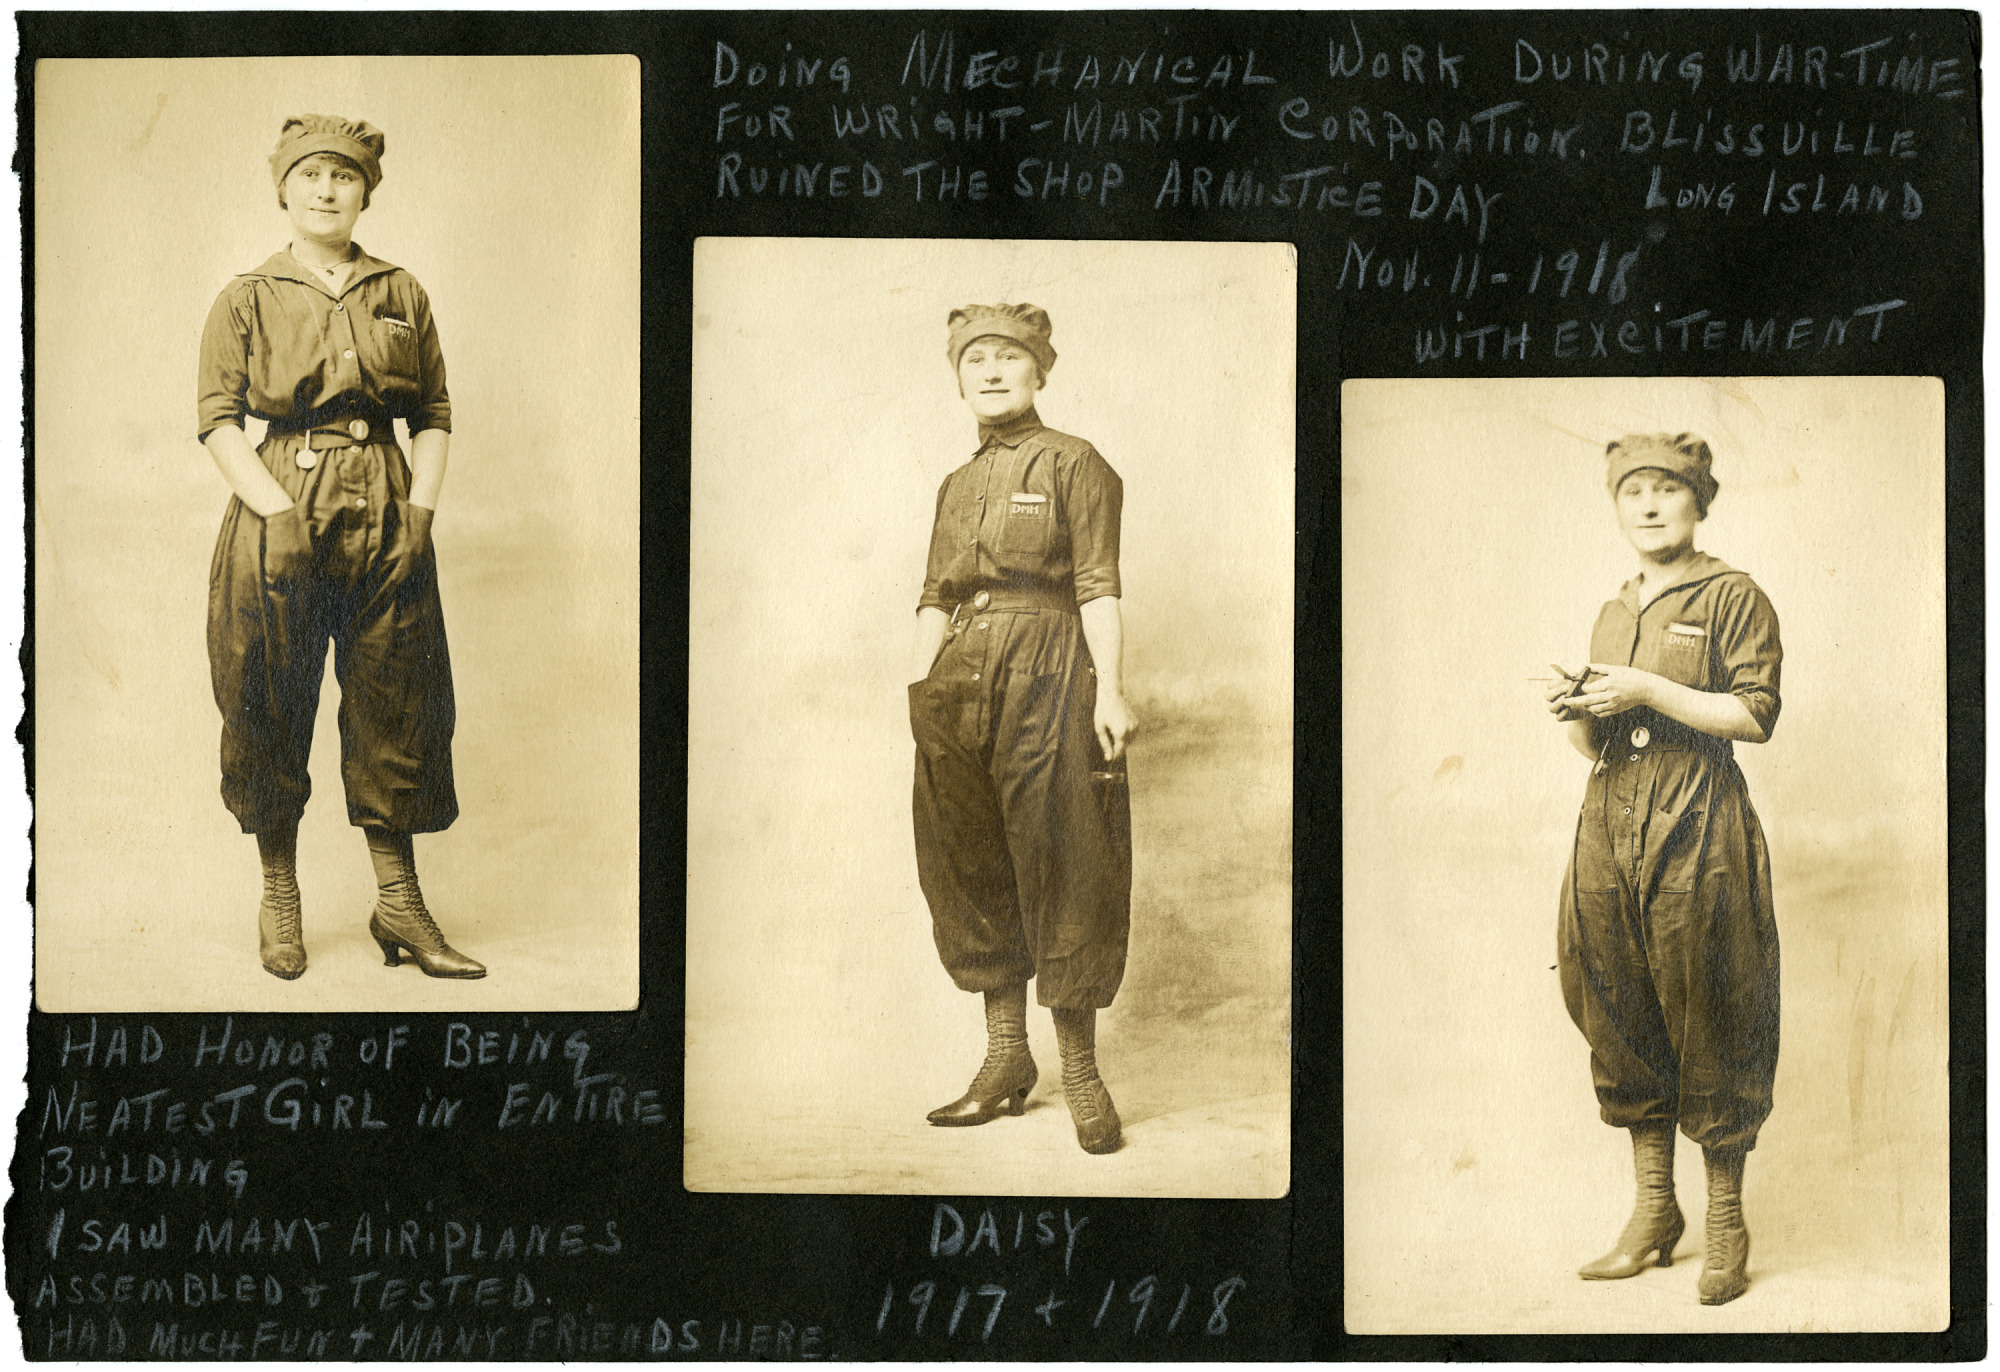 Daisy Mae Miller Wright-Martin Aircraft Corporation Uniform Photographs